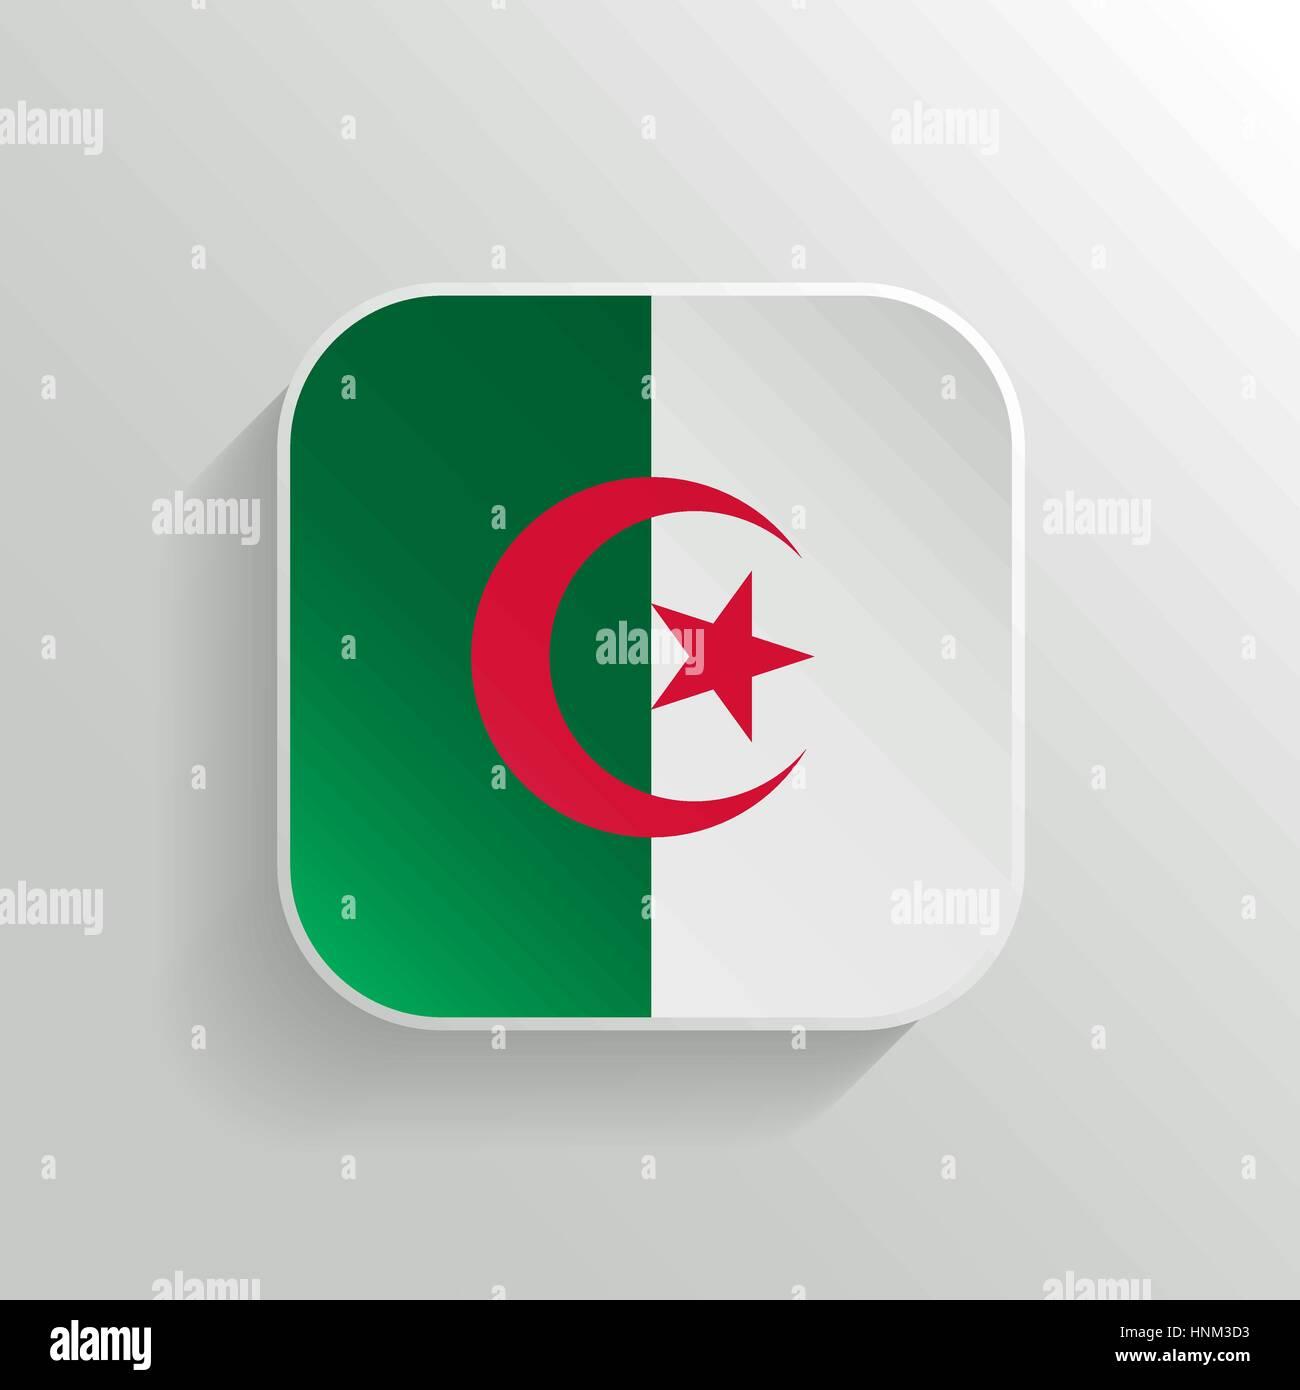 Vector Button - Algeria Flag Icon on White Background - Stock Vector